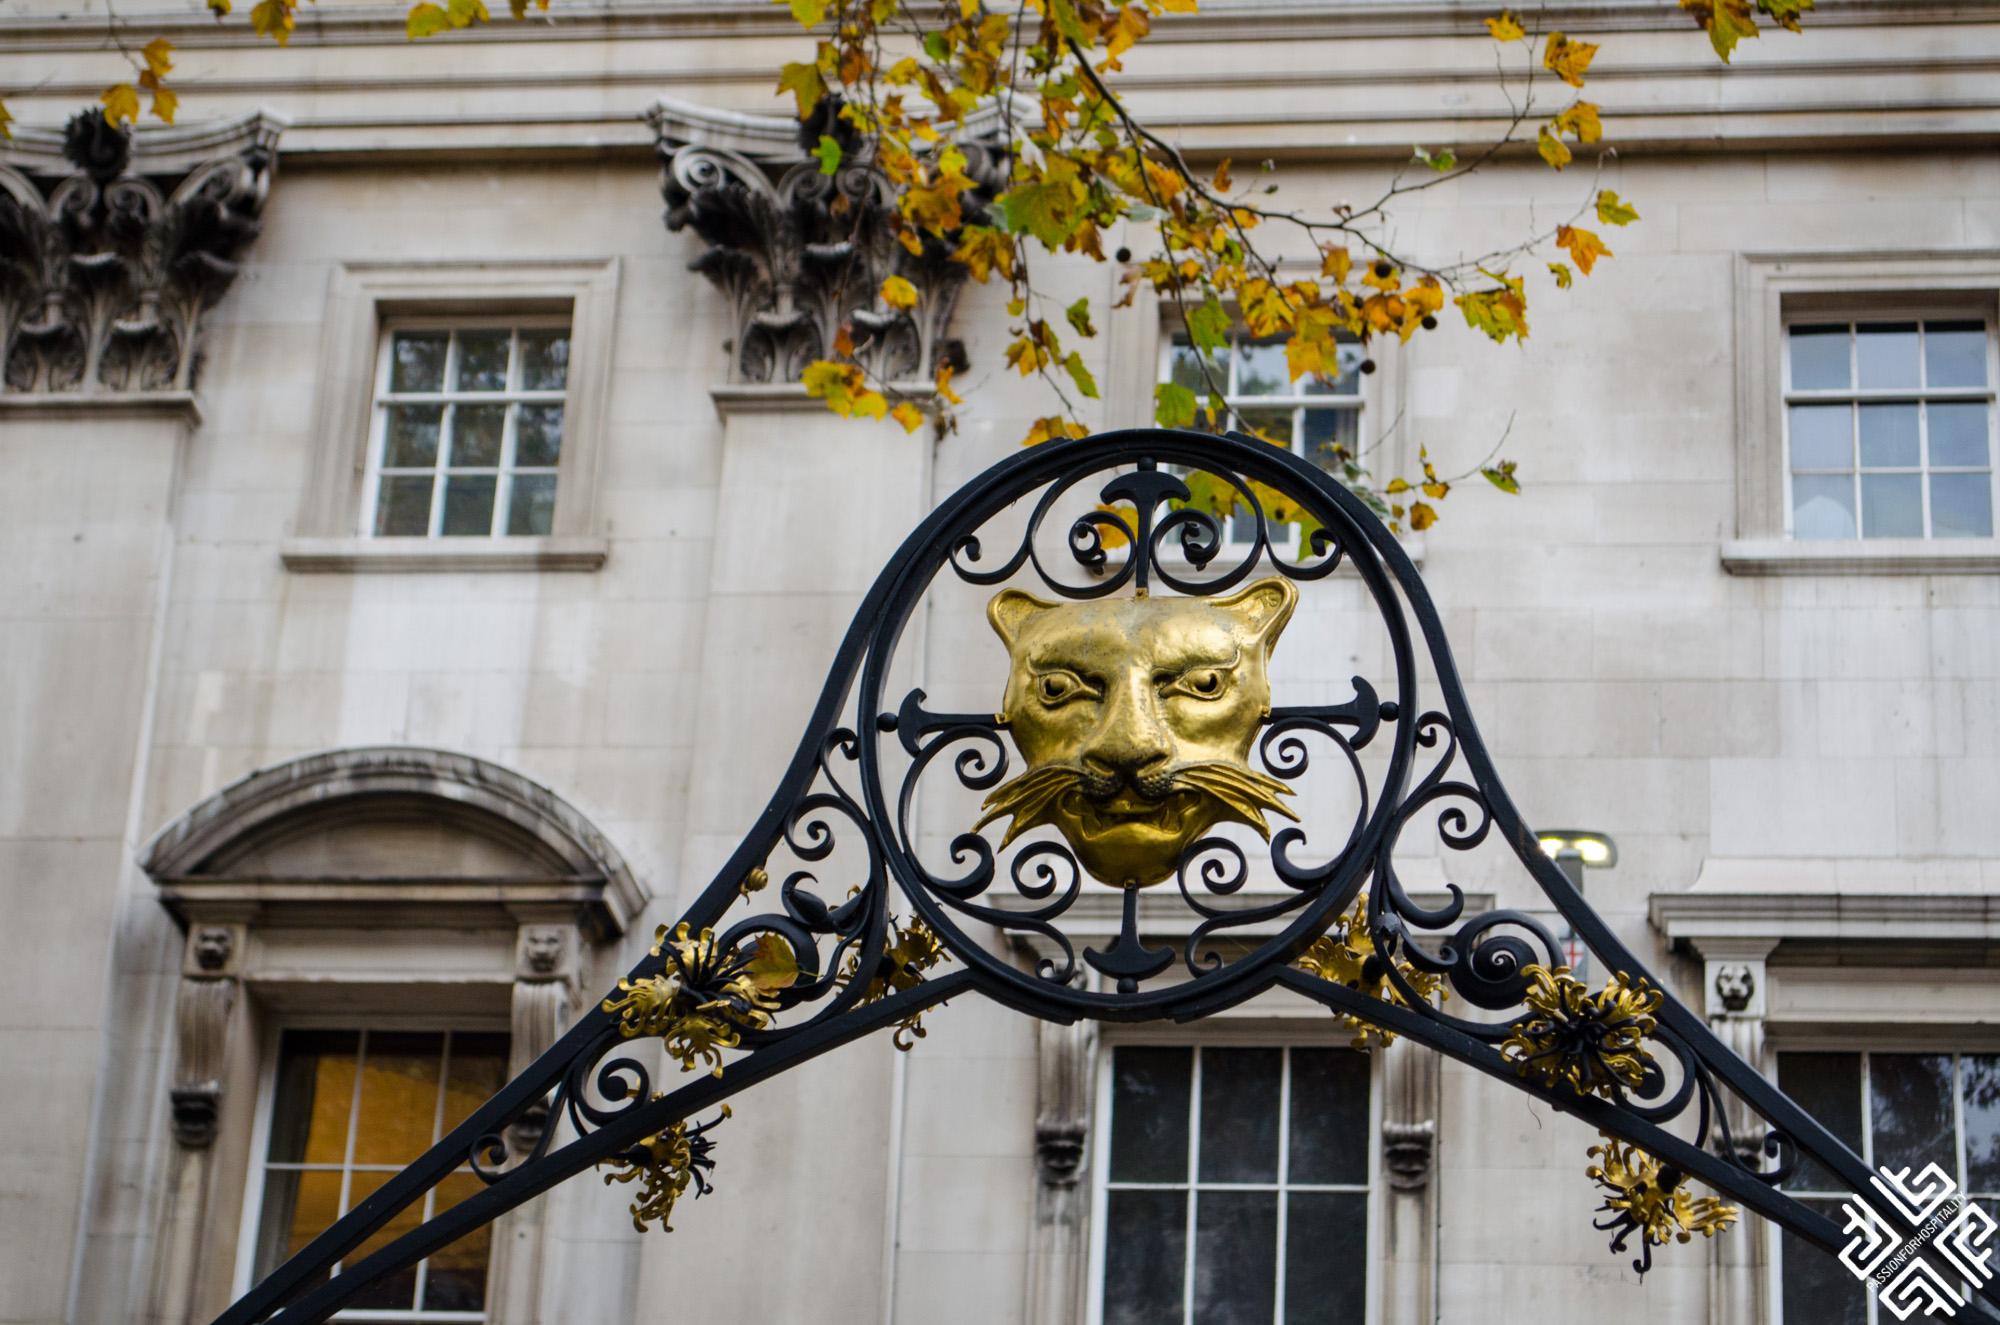 blue-badge-guide-city-of-london-tour-8